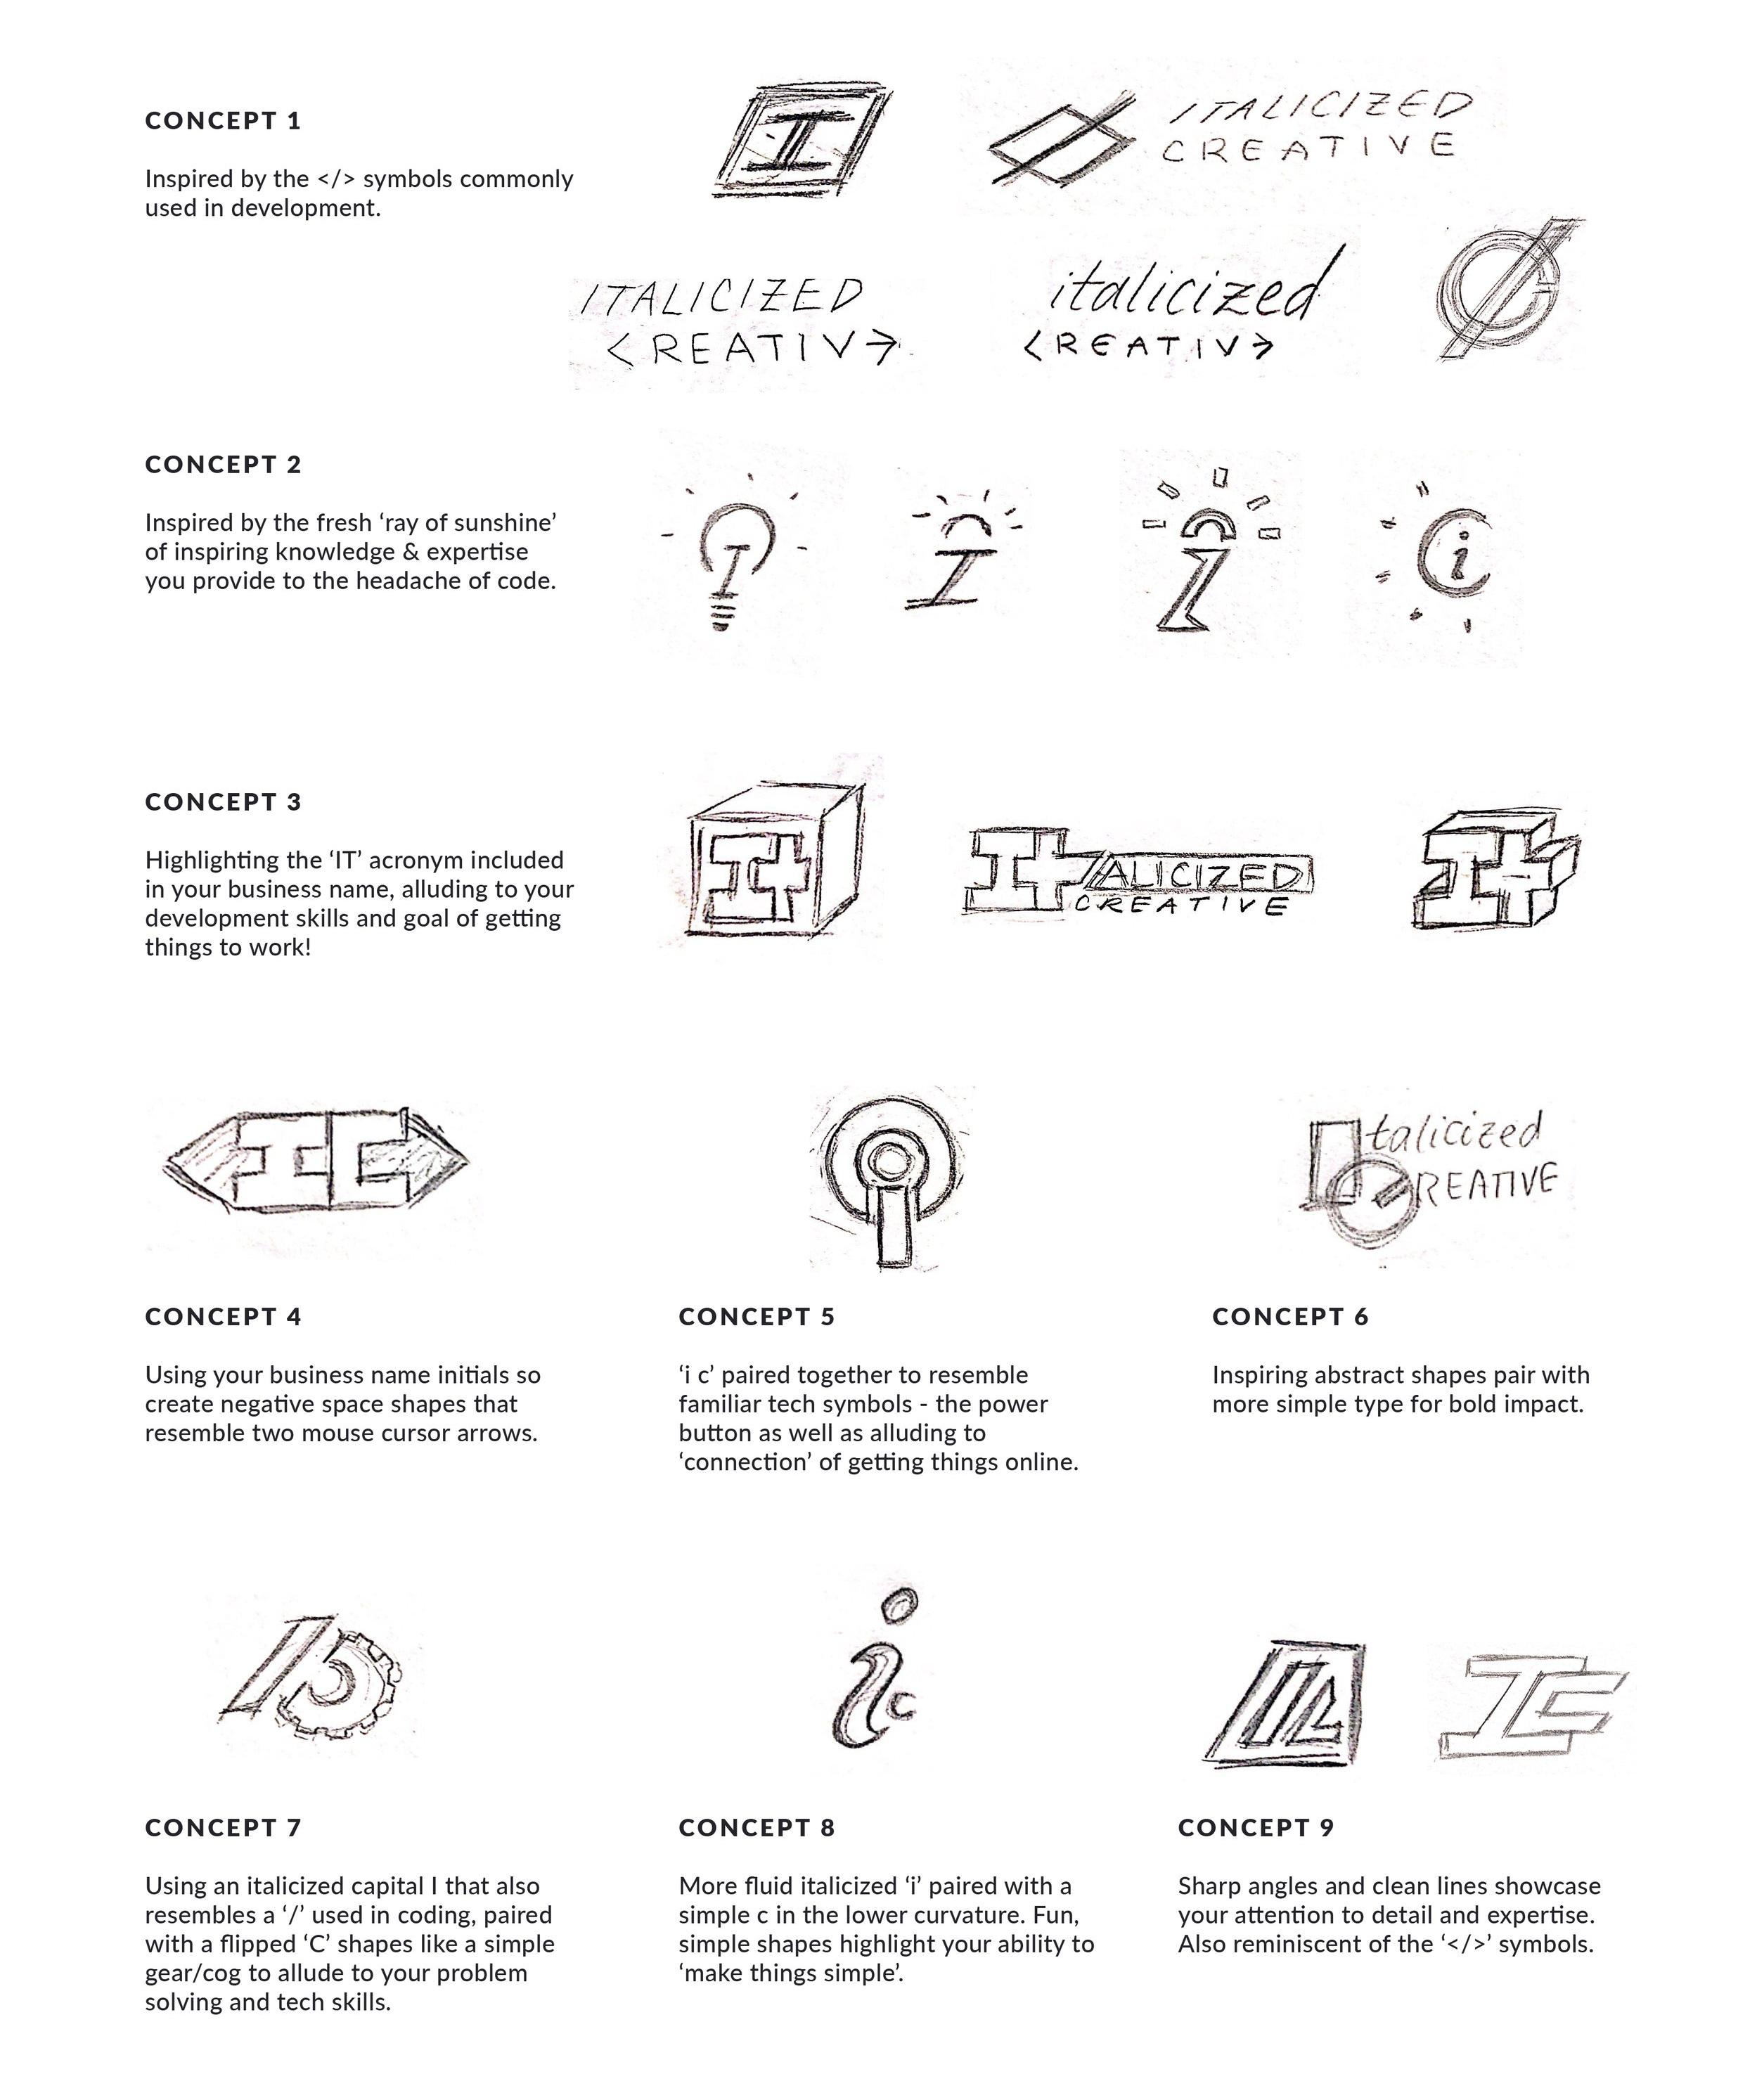 logo+brand+design+process+behind+the+scenes